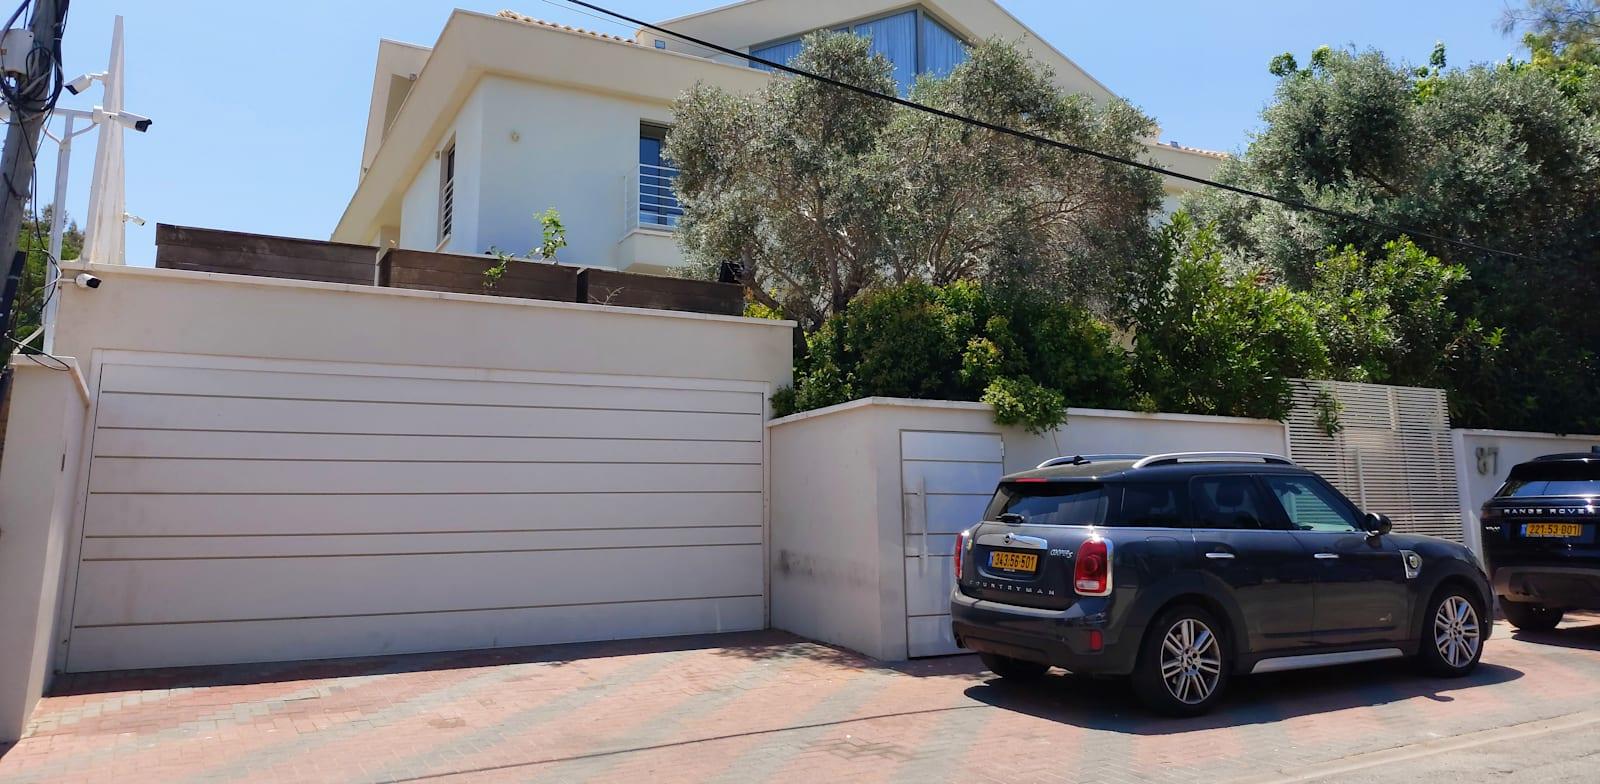 Leon Falic buys Herzliya home for NIS 88m